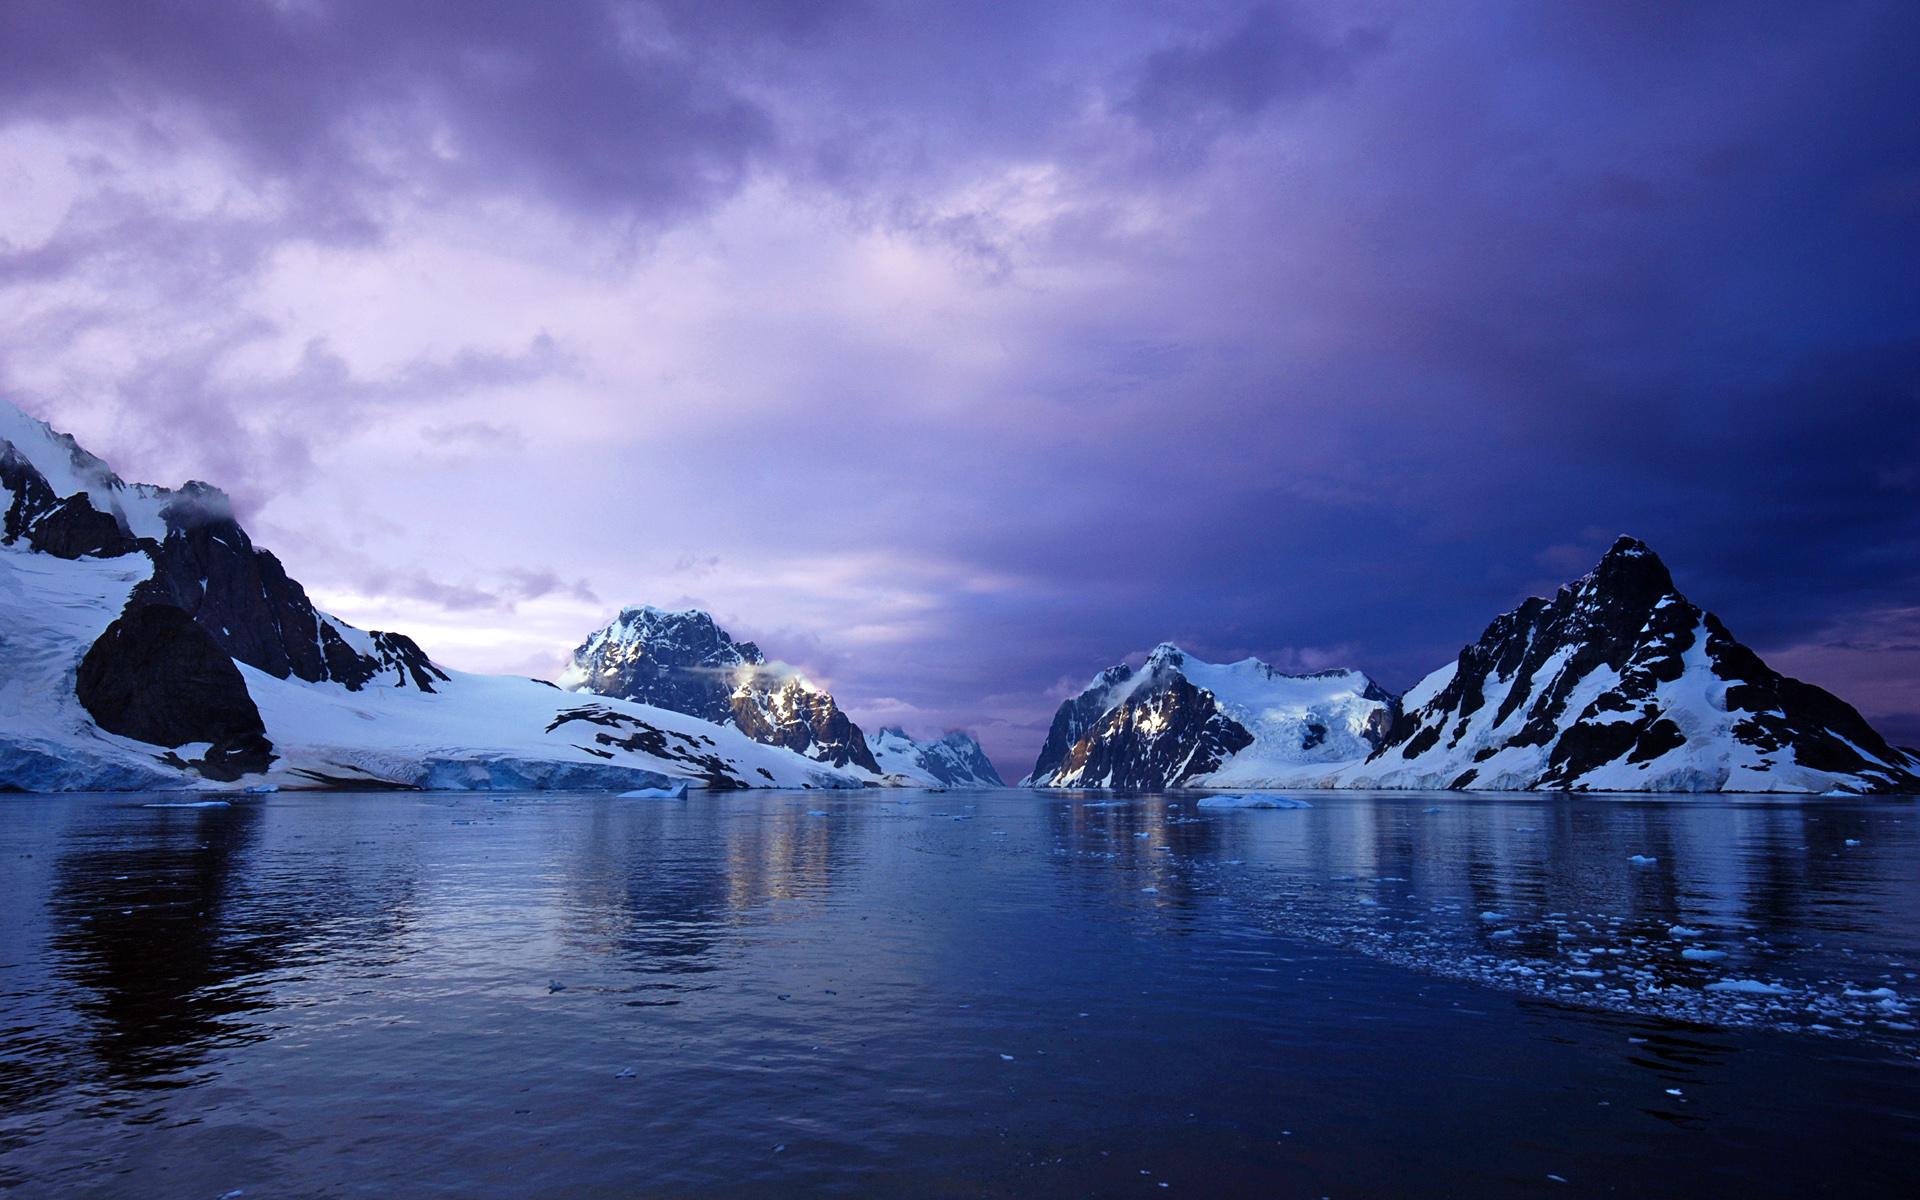 Stunning Antarctica Wallpaper 28862 1920x1200px 1920x1200